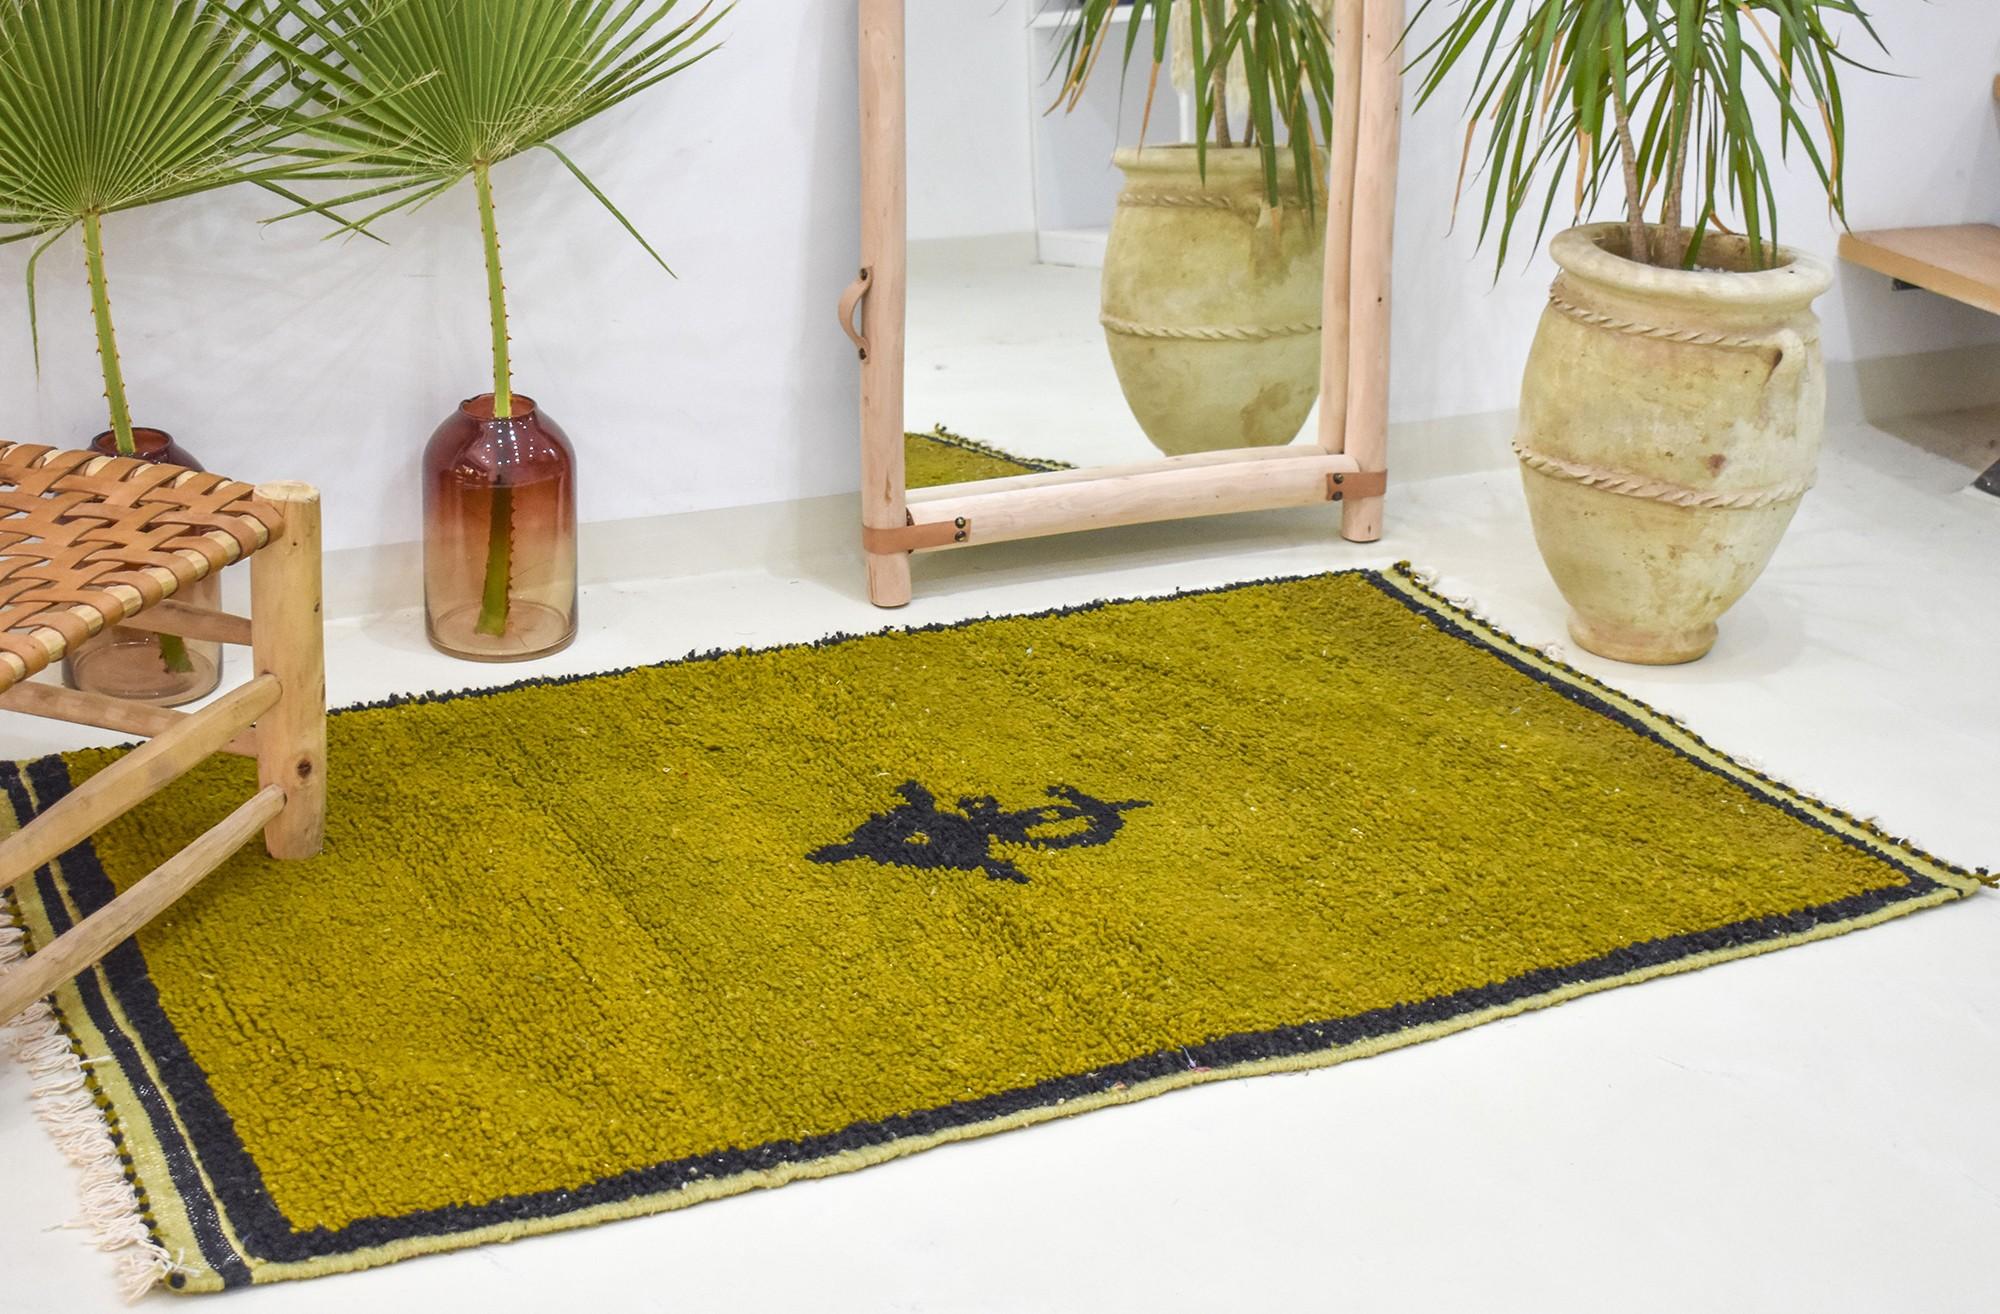 Tapis berbère vert pistache motif berbère